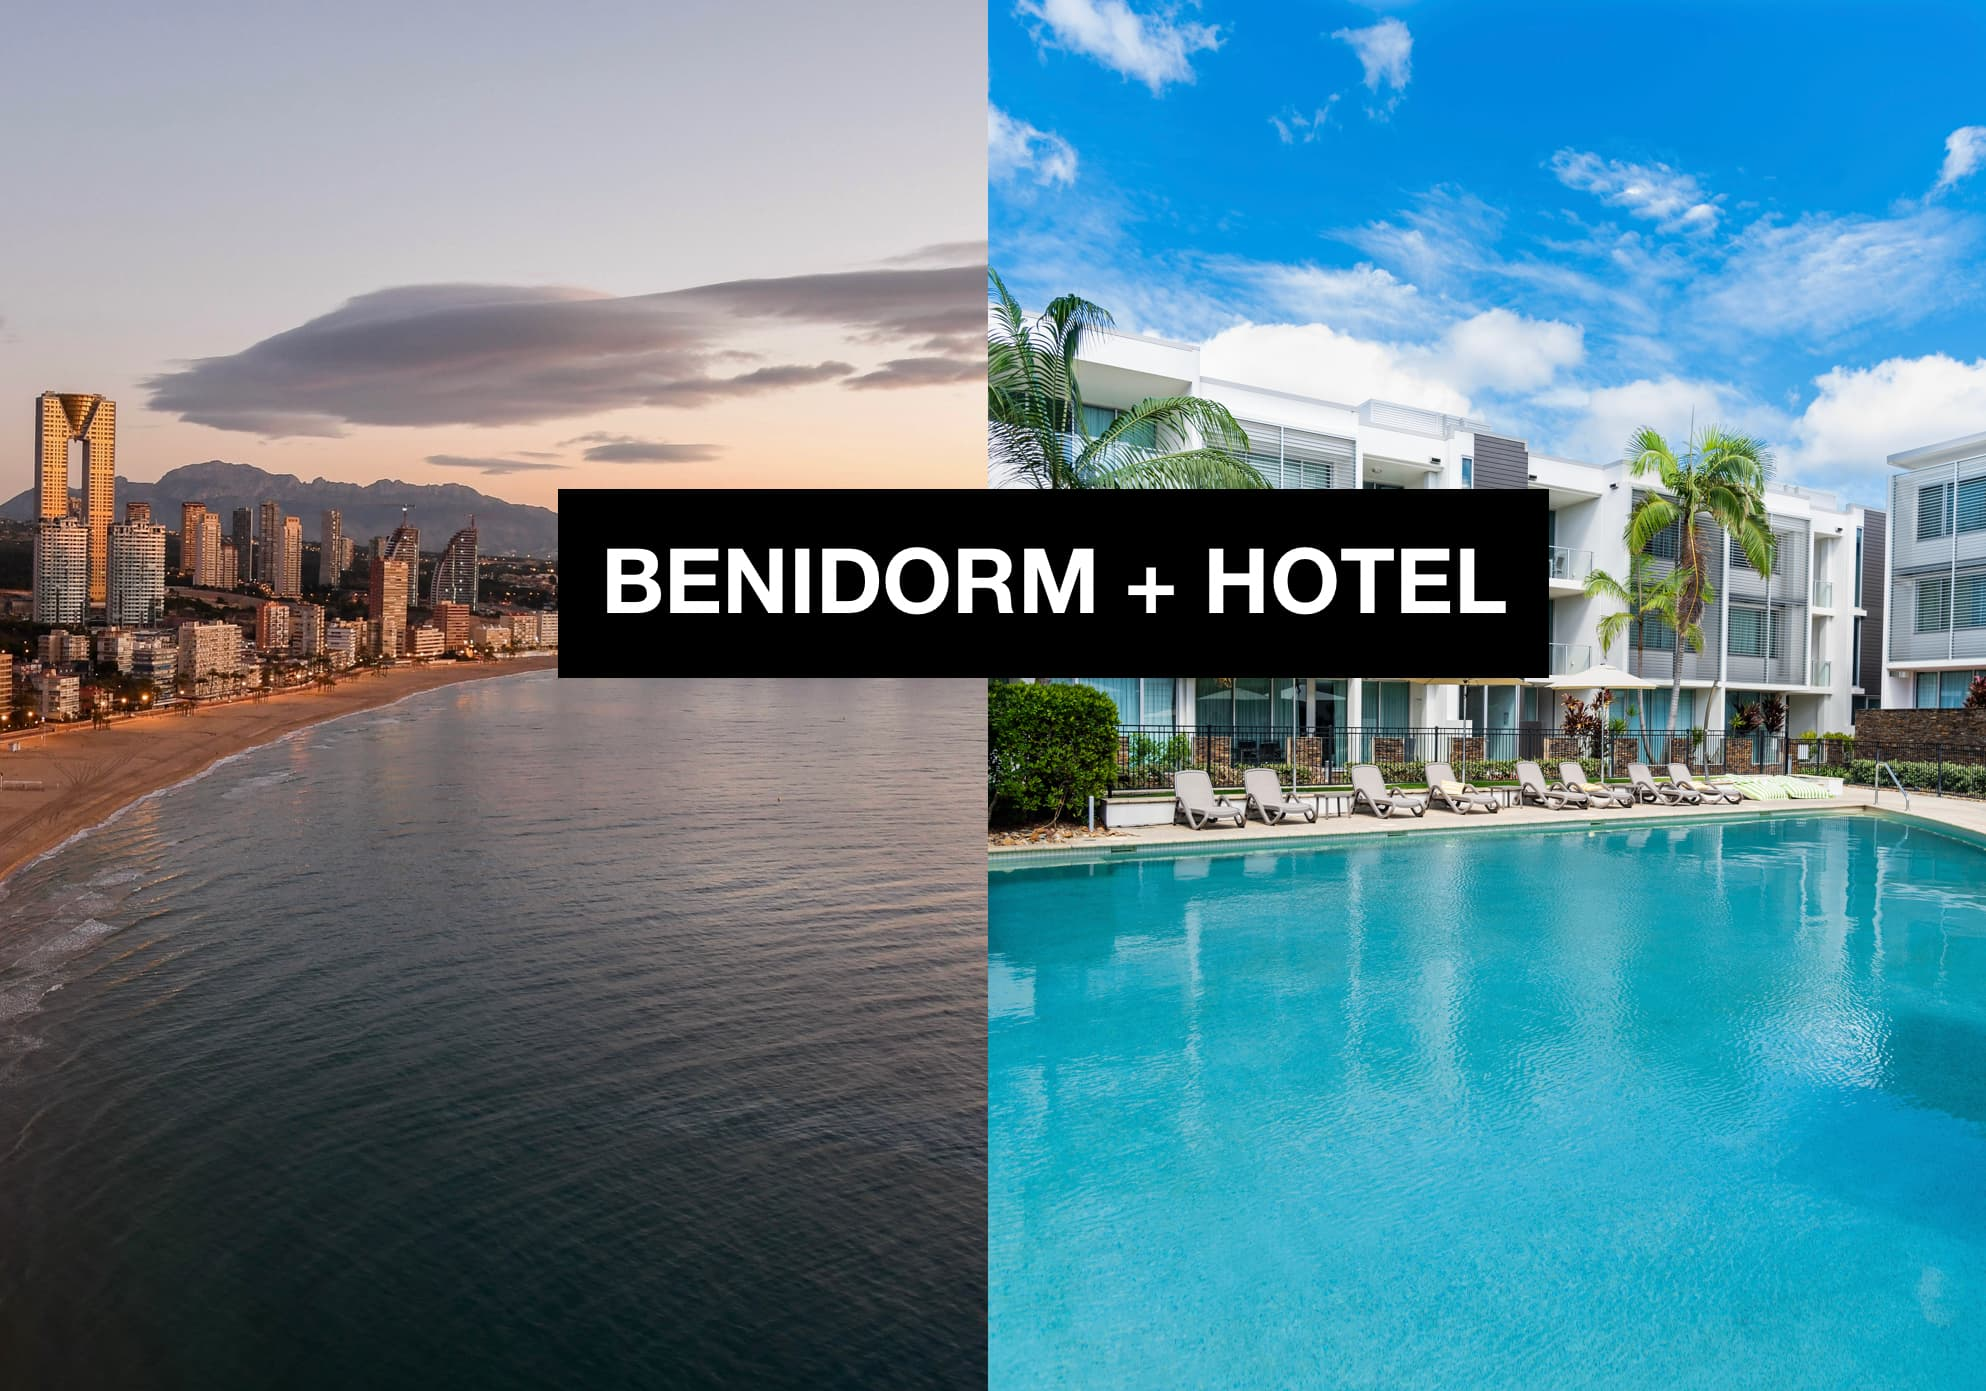 BENIDORM + HOTEL